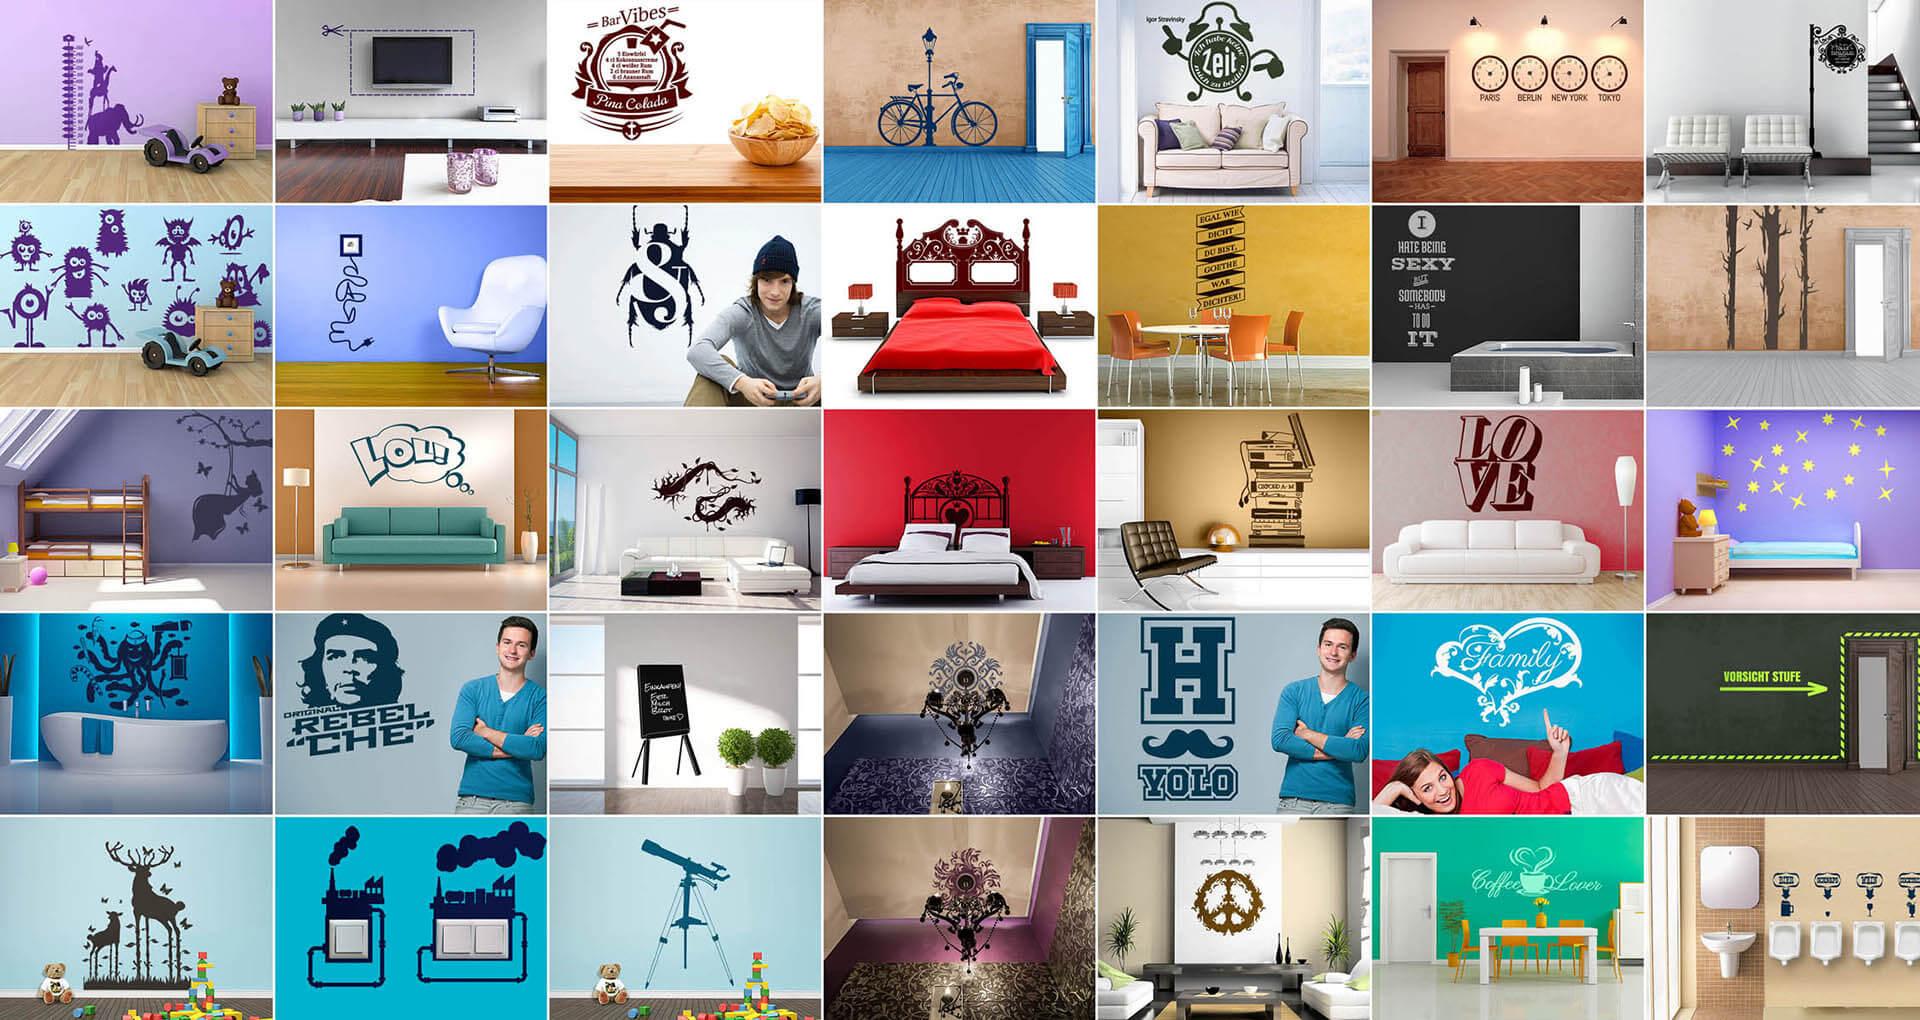 webtoprint fotobook variable graphics walltattoo popart calendar smartphone case greeting card  22